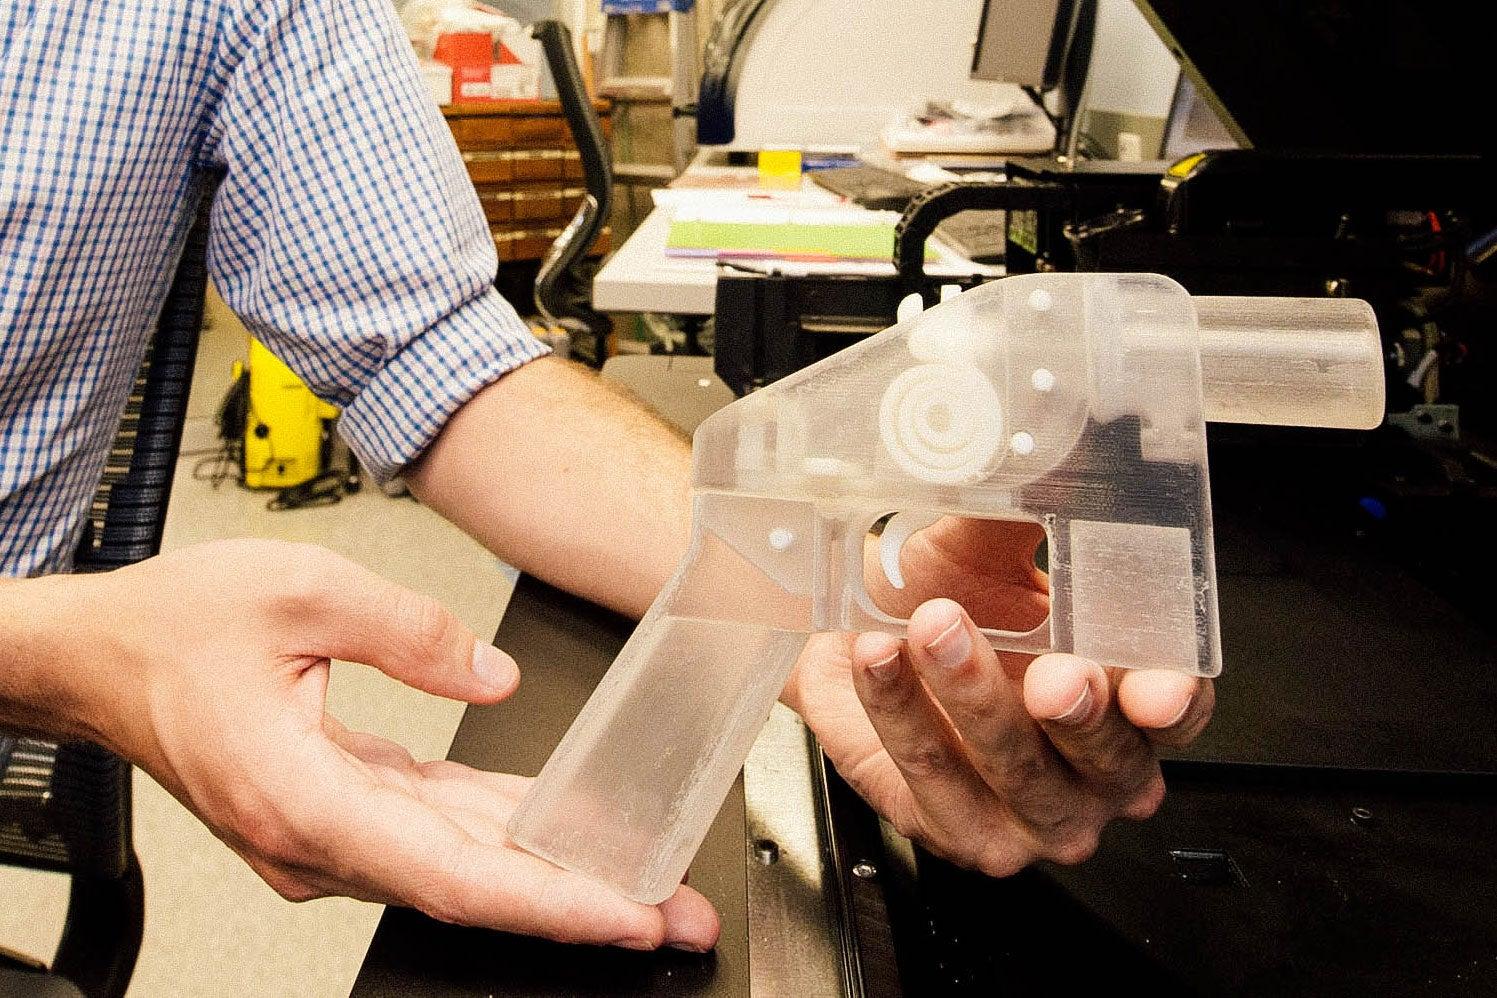 Daniel Southwick shows off a gun made by a 3D printer.